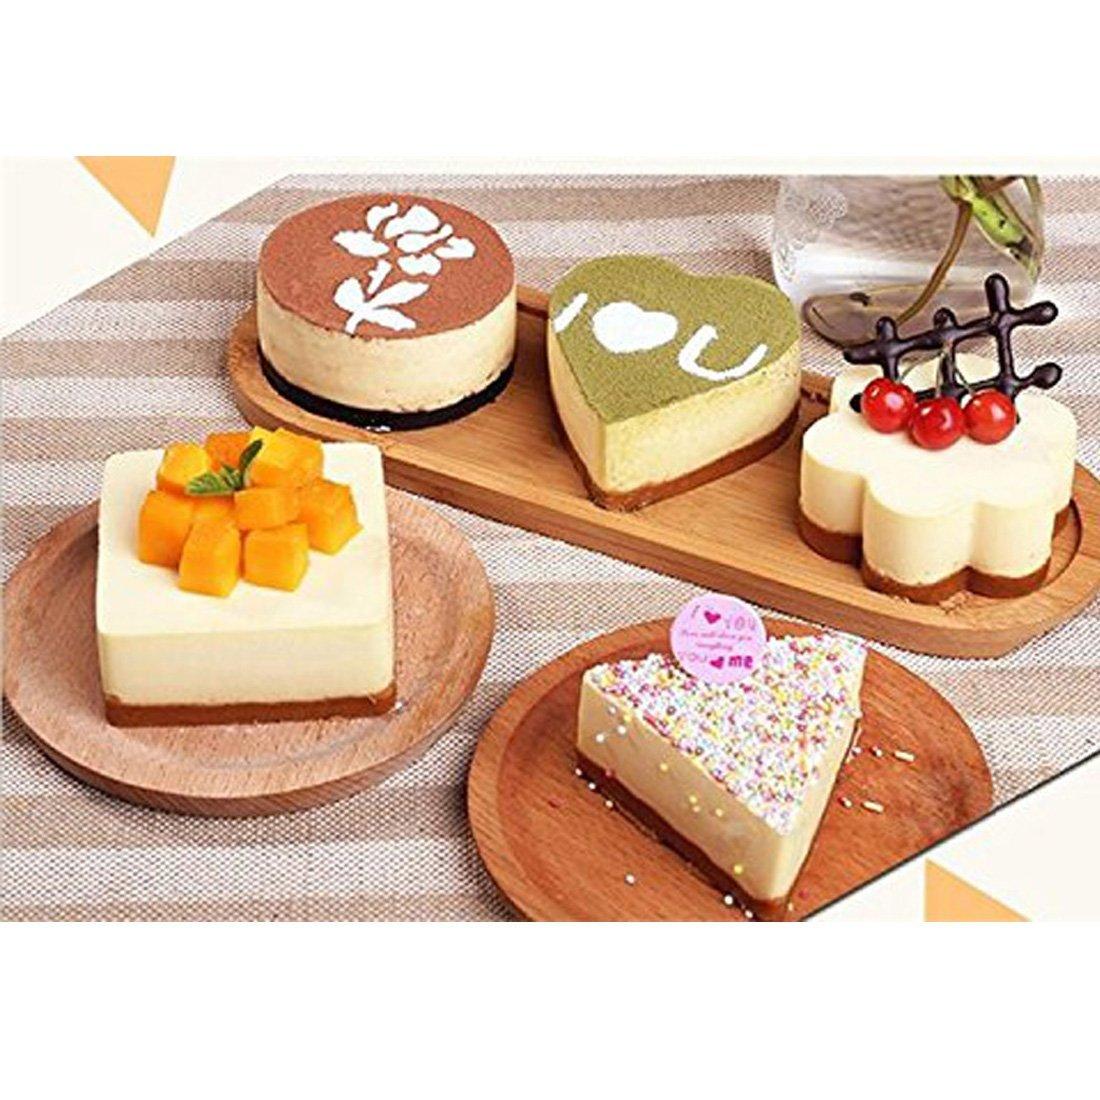 Amazon.com: eDealMax acero inoxidable DIY Pequeño Mousse Anillo Lamy Cheese Cake herramientas de moldeo del molde de alimentos (5 en 1): Kitchen & Dining